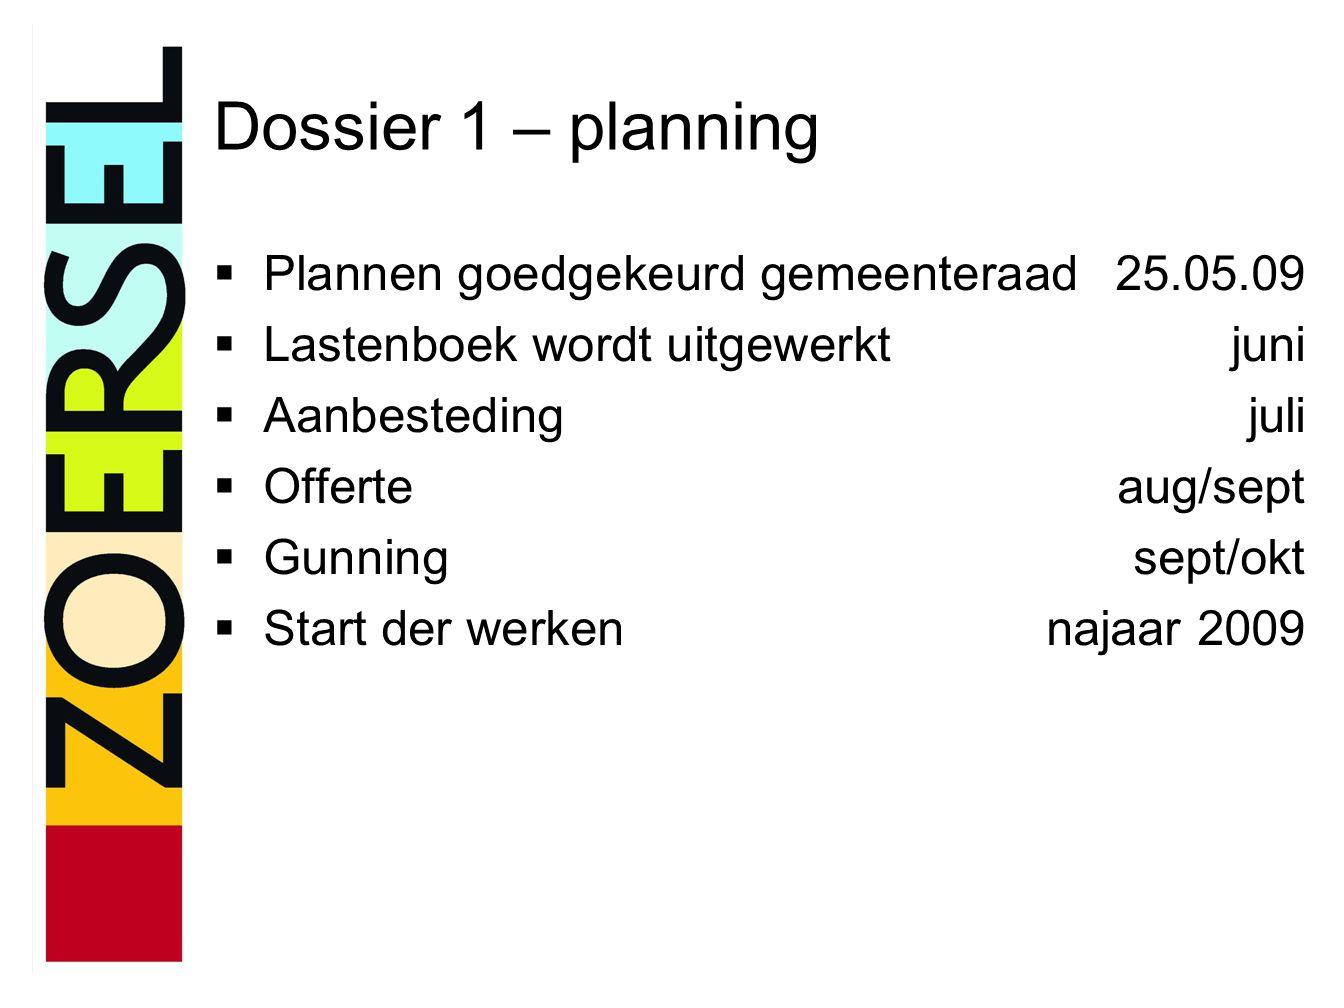 Dossier 1 – planning  Plannen goedgekeurd gemeenteraad25.05.09  Lastenboek wordt uitgewerktjuni  Aanbestedingjuli  Offerteaug/sept  Gunningsept/okt  Start der werkennajaar 2009